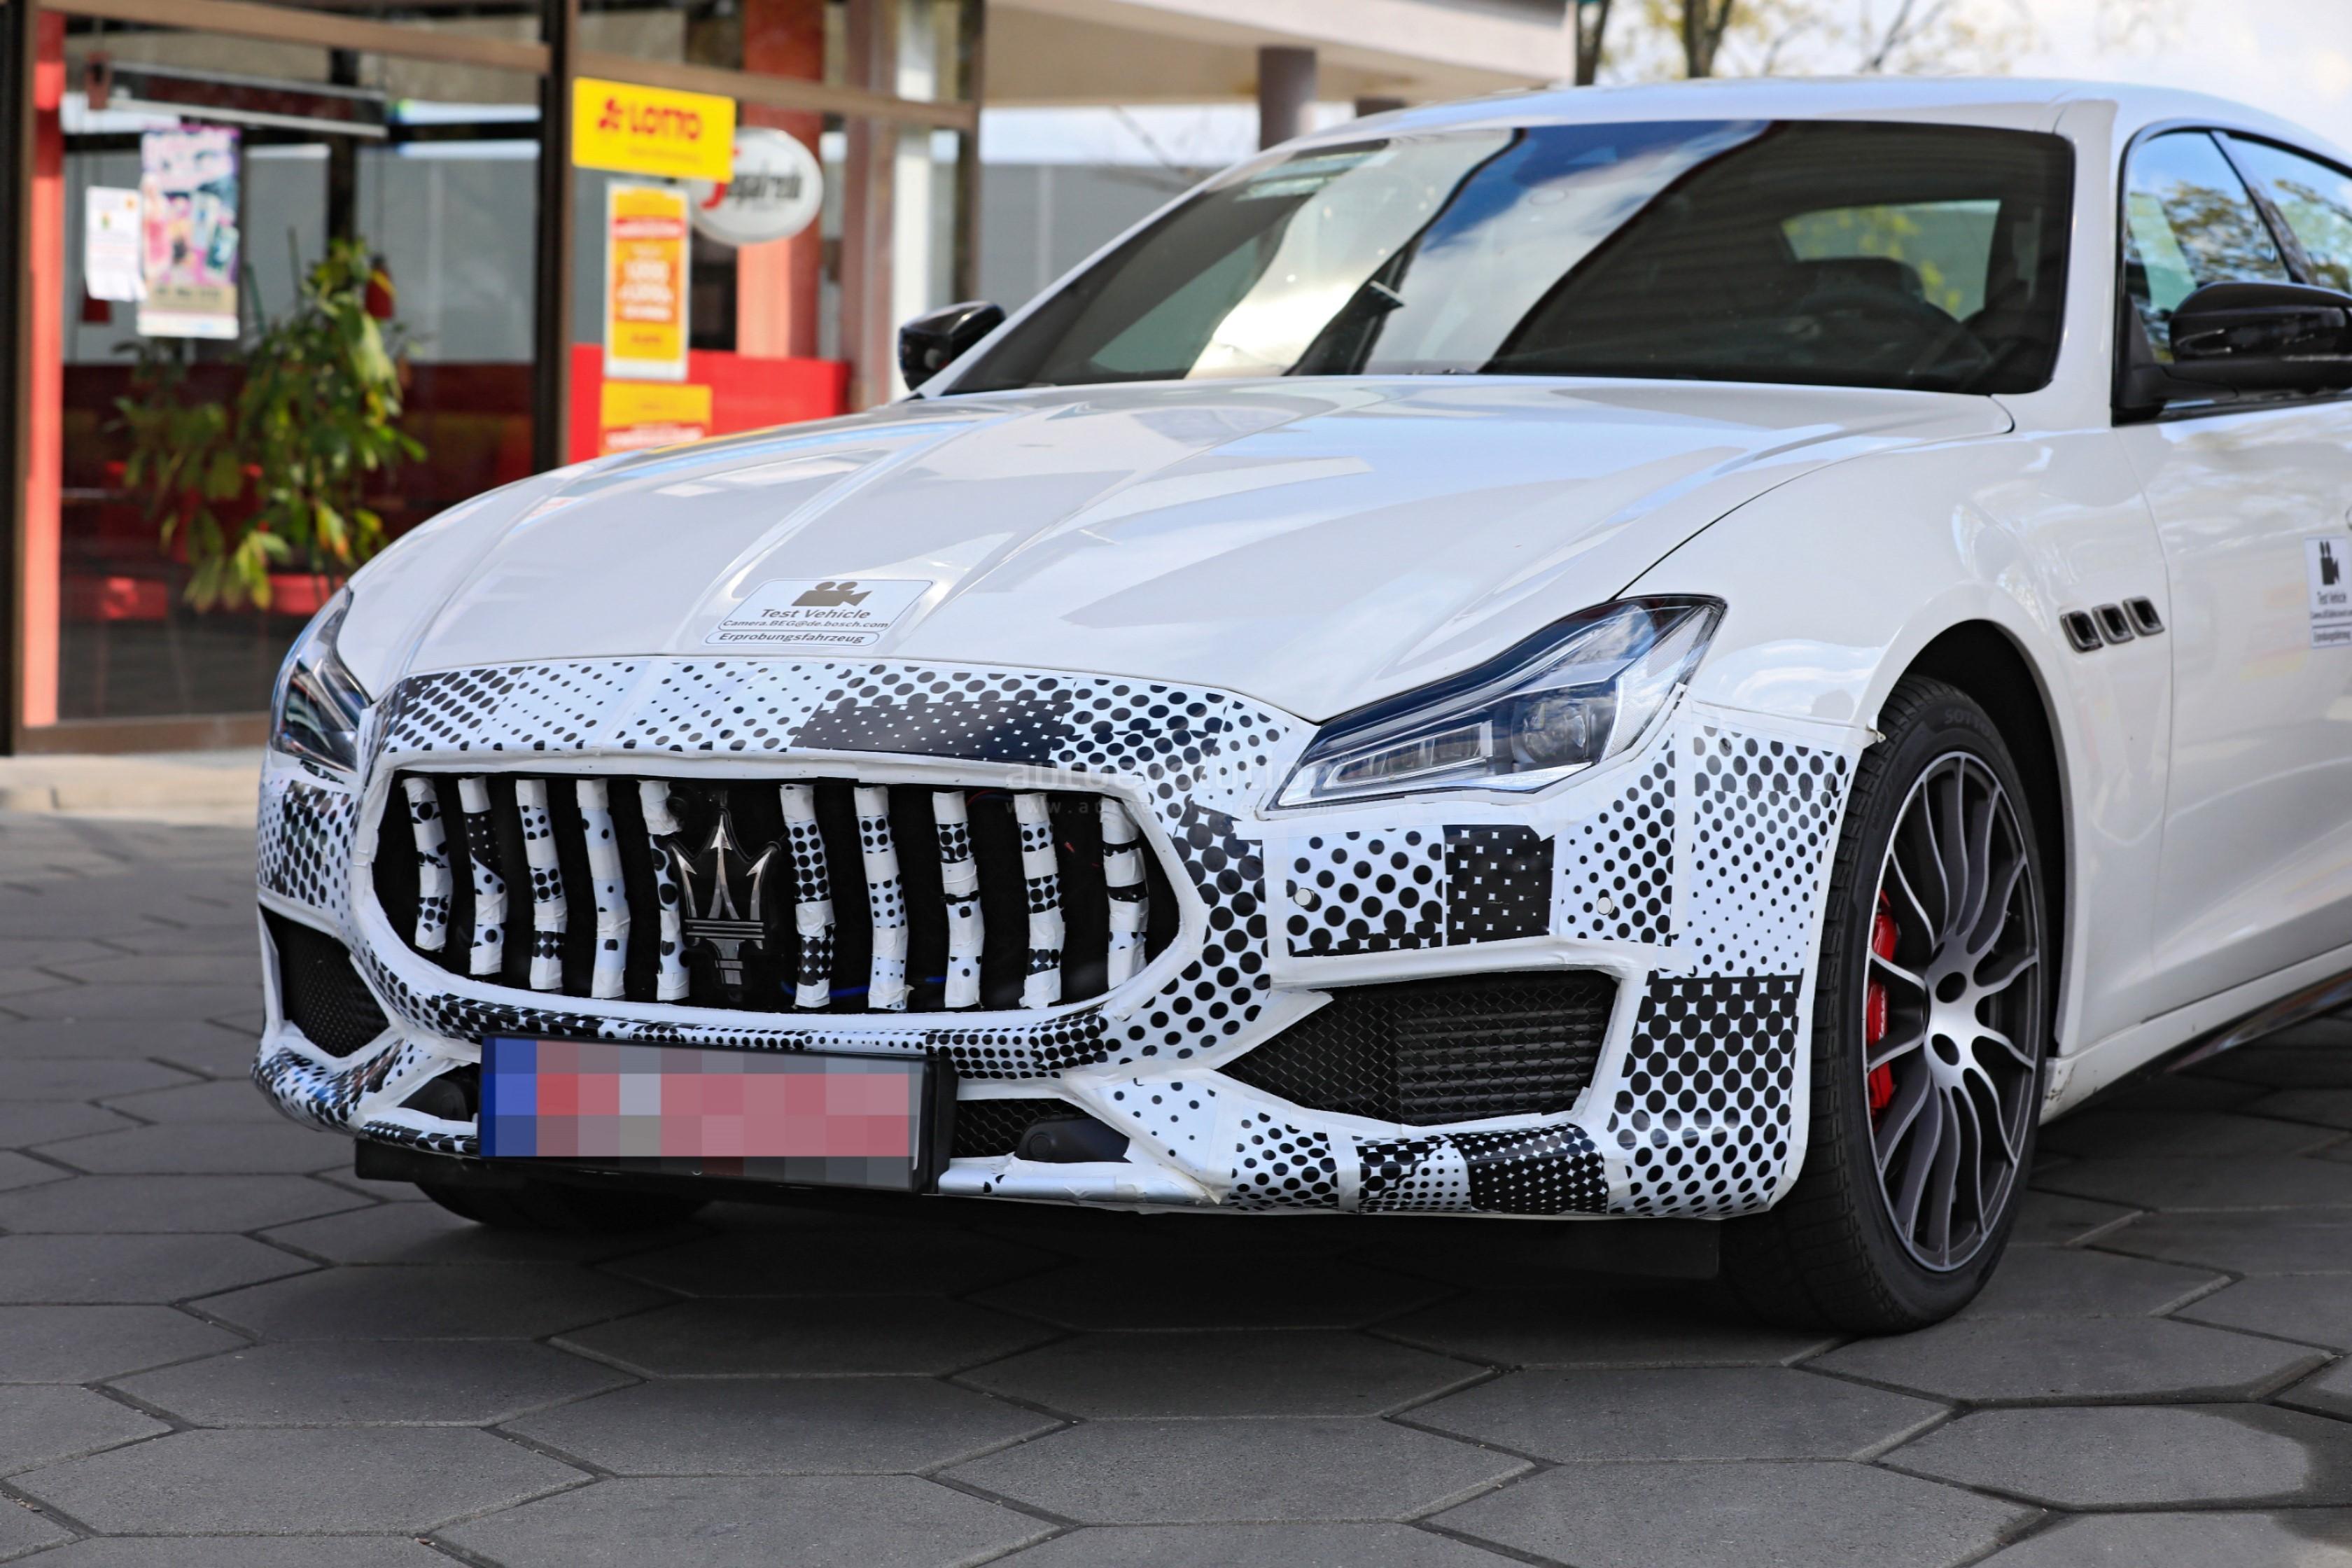 2021 Maserati Quattroporte Facelift Spied, Prototype Features FCA Uconnect 5 - autoevolution